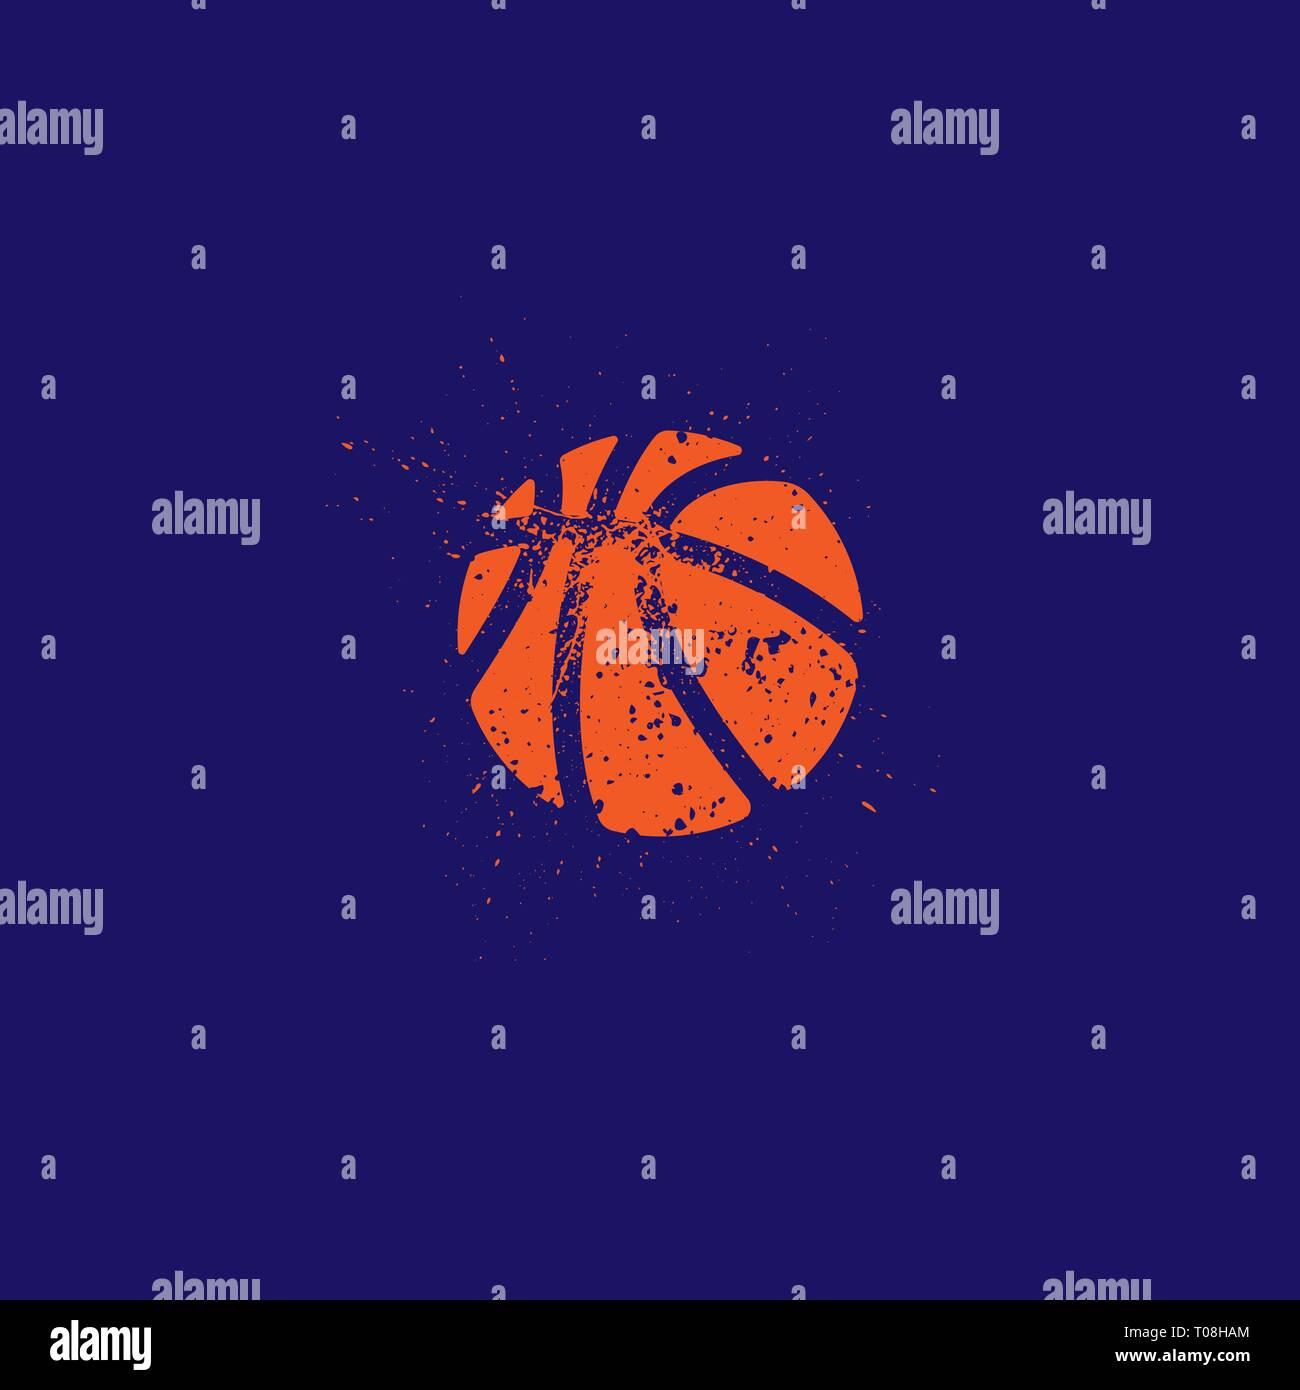 Grunge basketball orange isolé silhouette onn fond bleu foncé Photo Stock